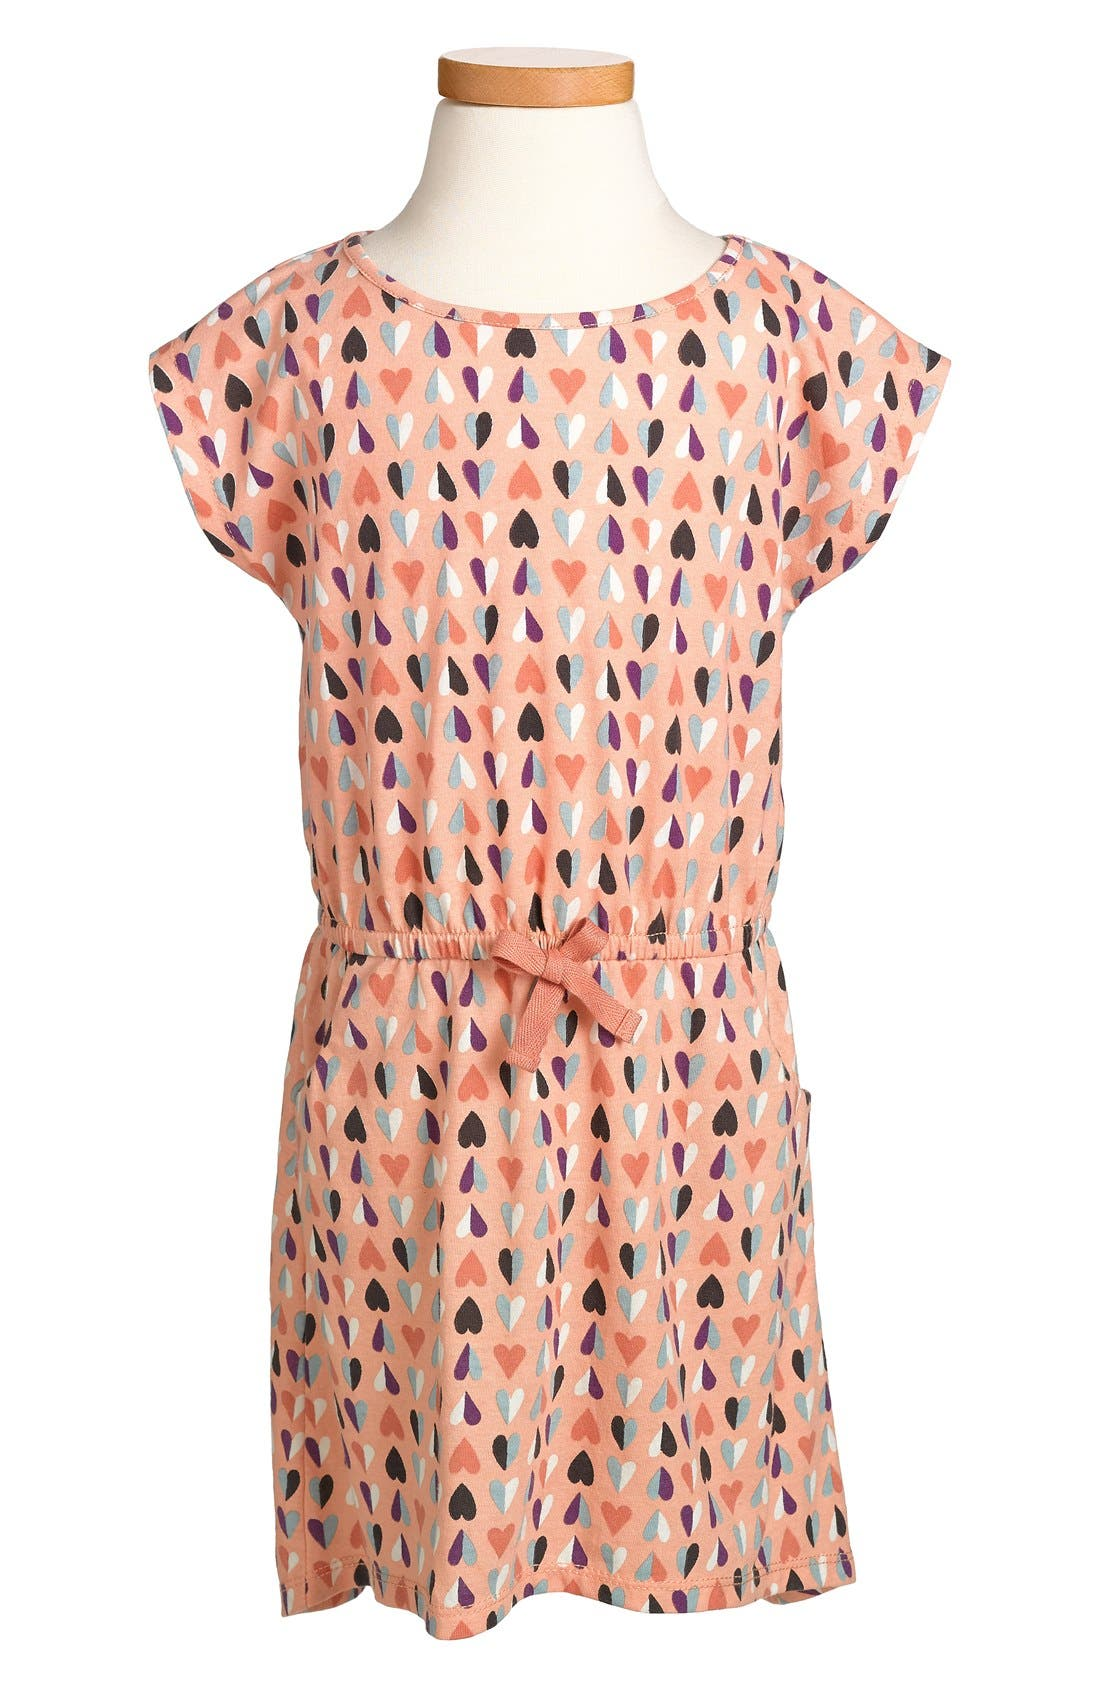 Main Image - Tucker + Tate 'Reiko' Print Dress (Toddler Girls)